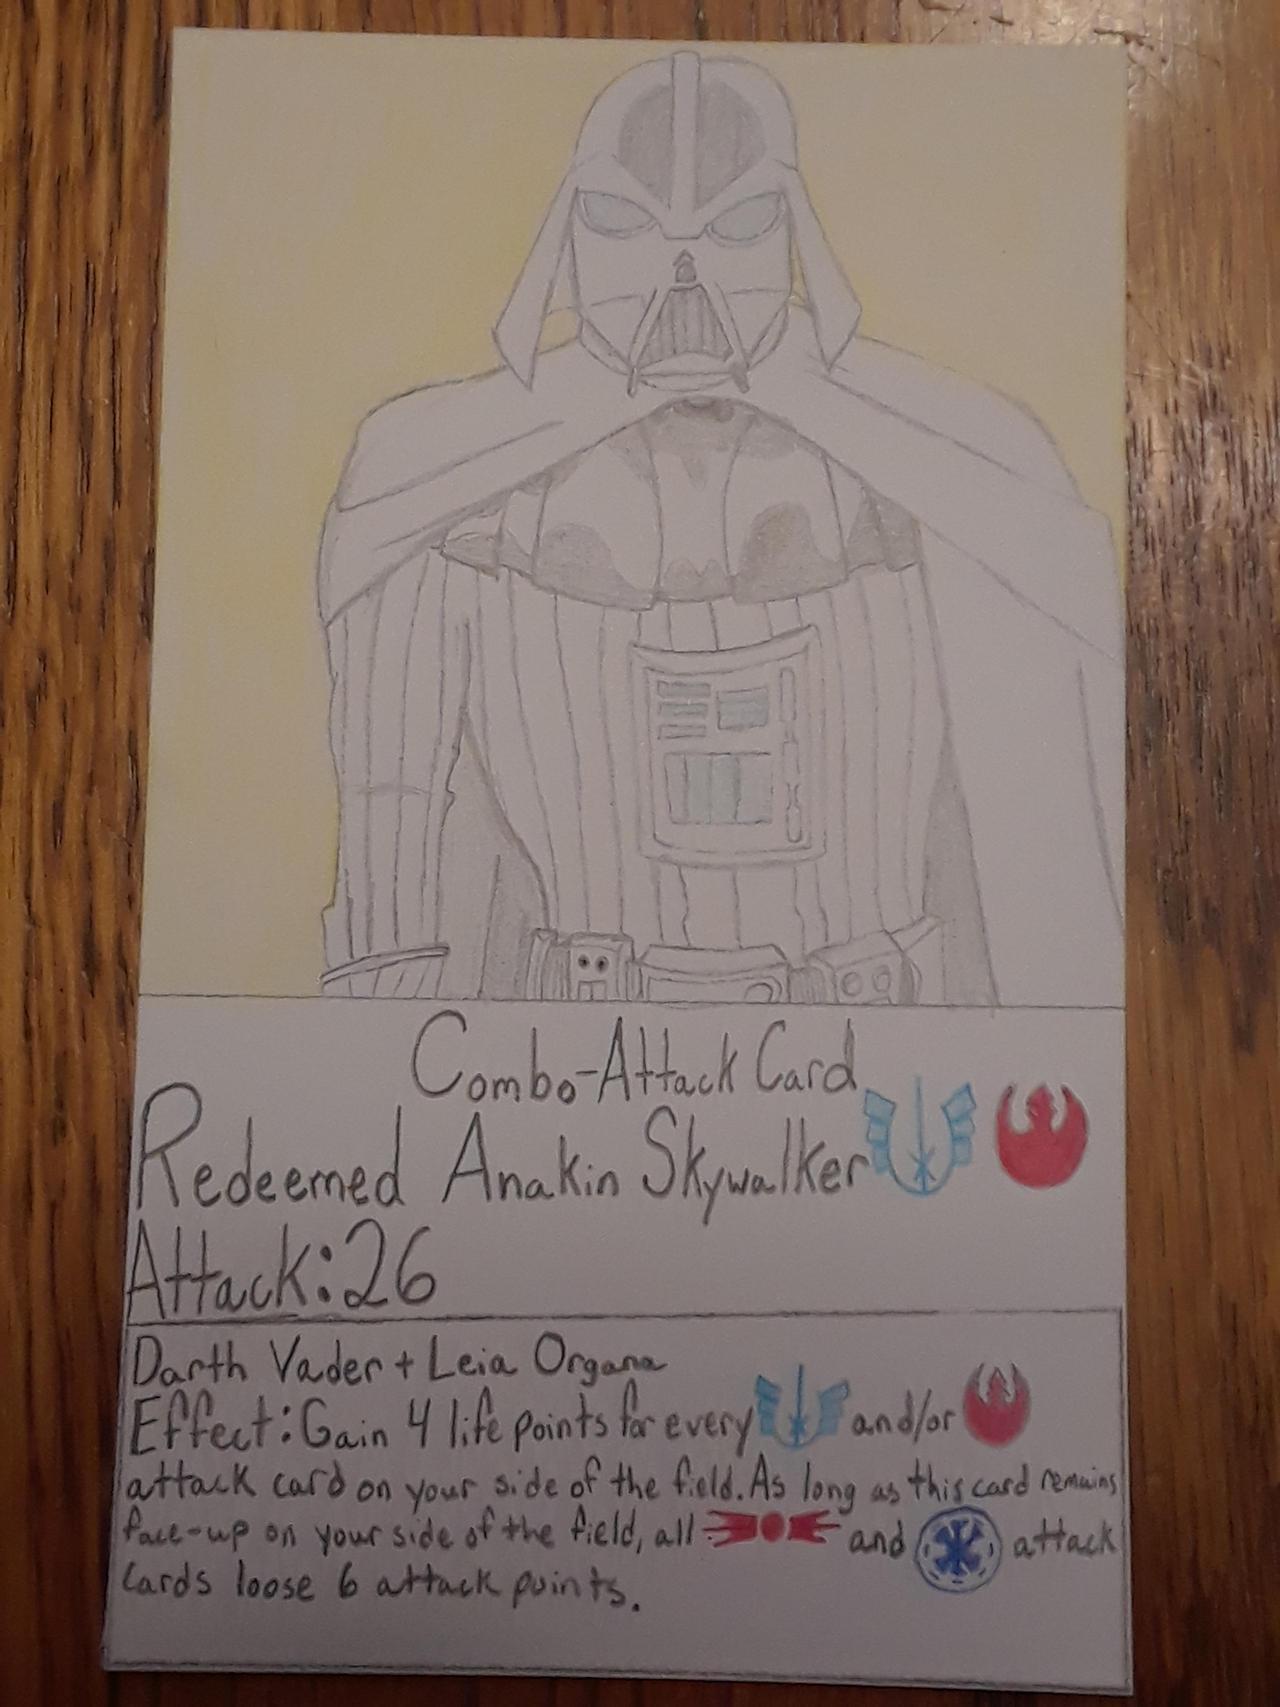 Redeemed Anakin Skywalker Combo-AttackCard(Redone)